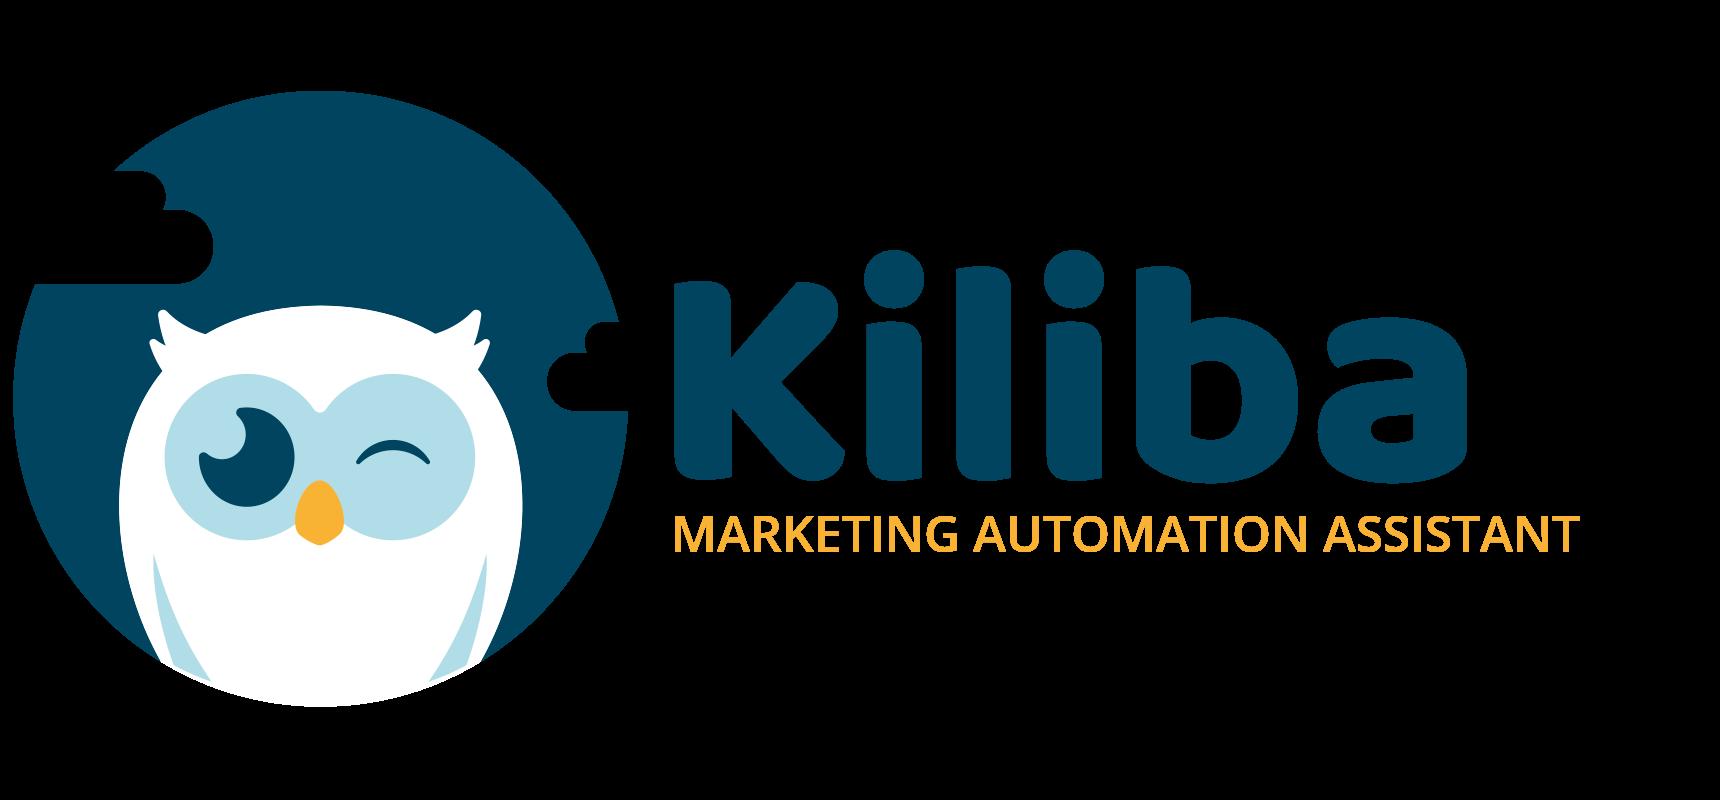 Well choisit Kiliba pour dynamiser sa Relation Client